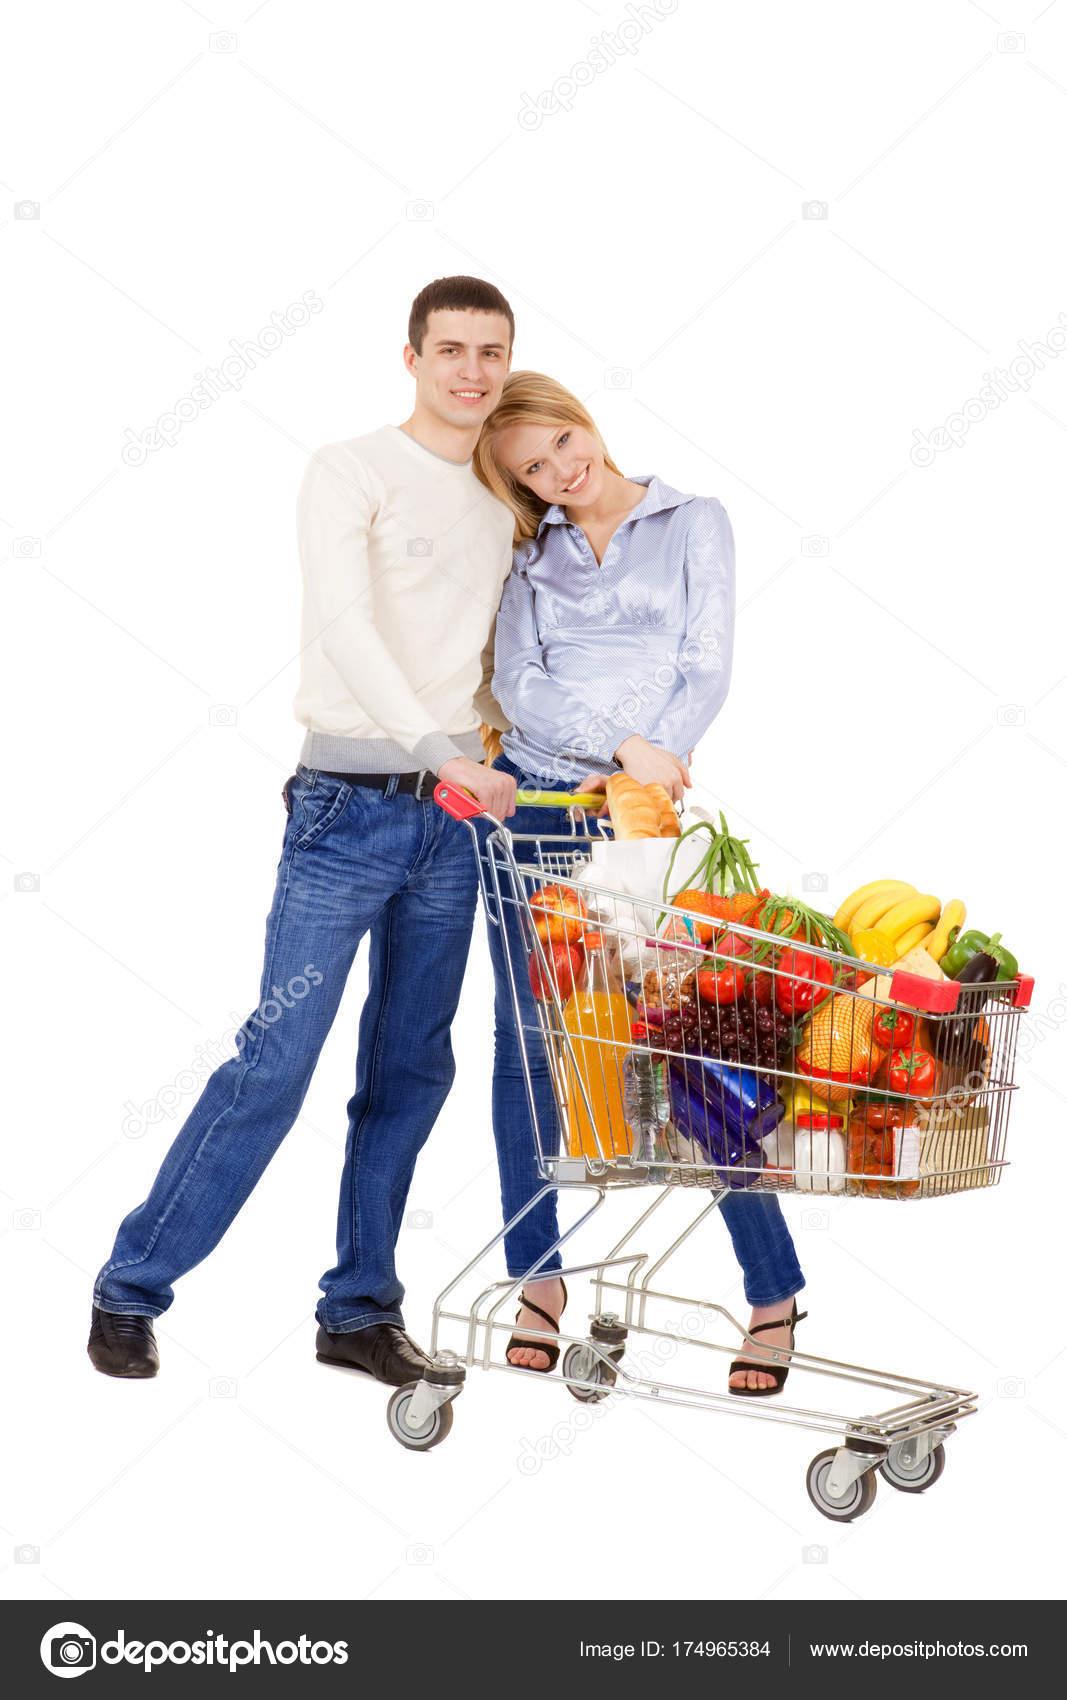 dating shopping cart